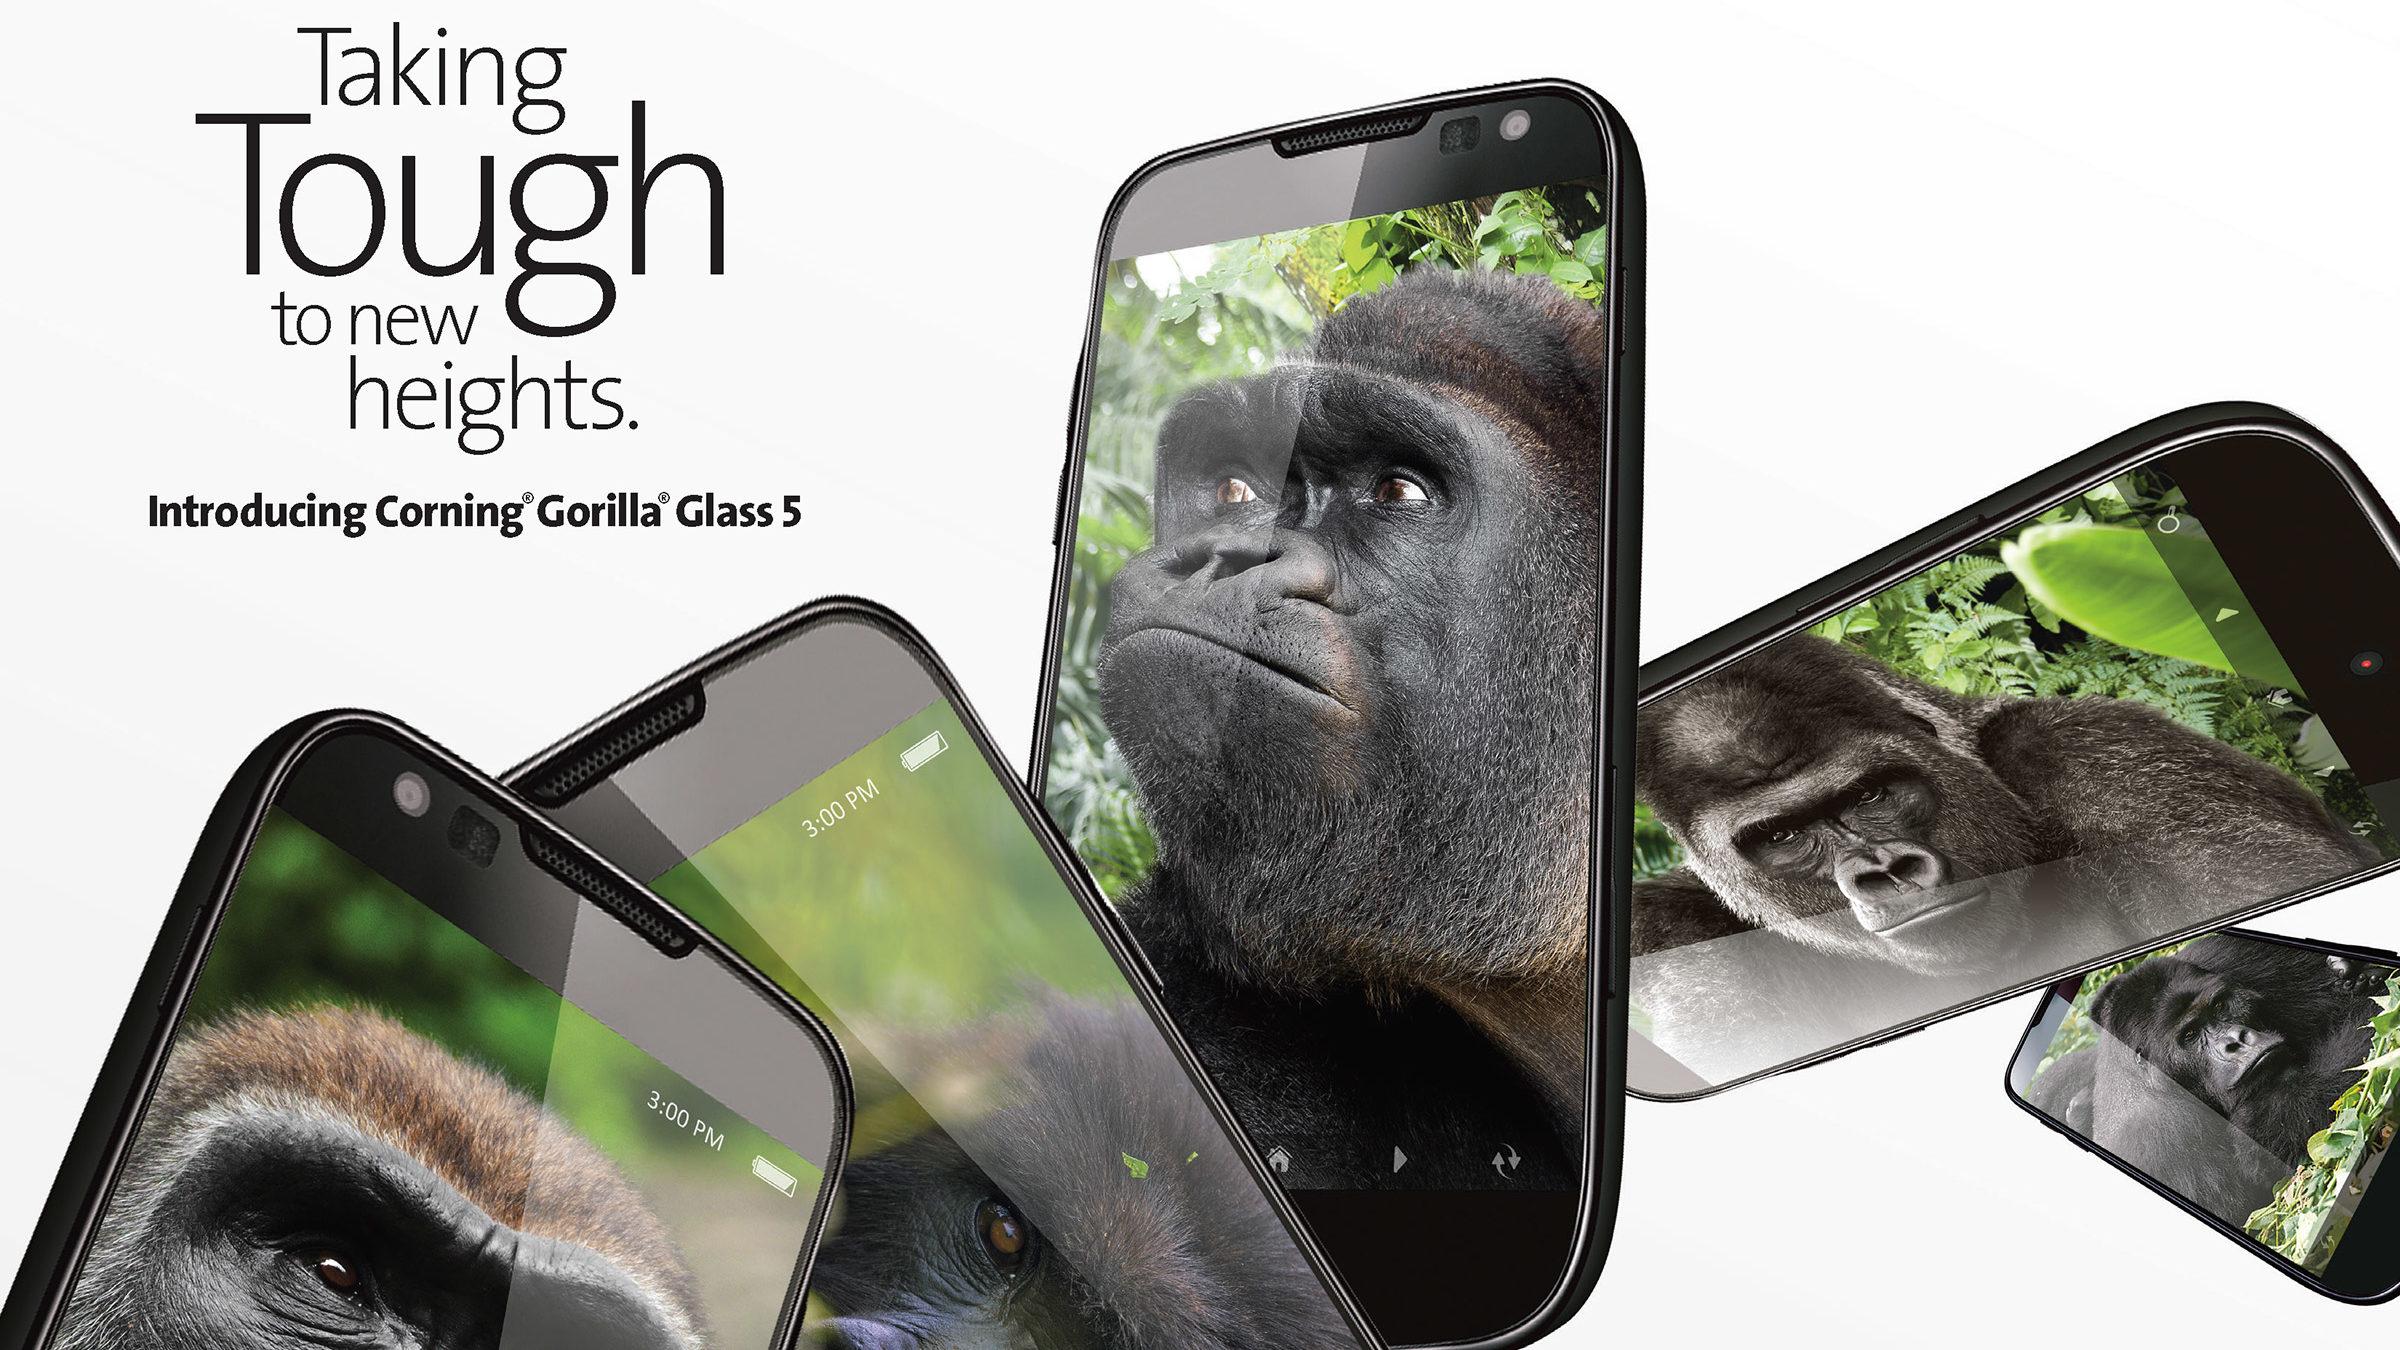 Gorilla Glass 5 kommer i de første mobilene allerede denne høsten. Nå tripper arvtageren i døra allerede.